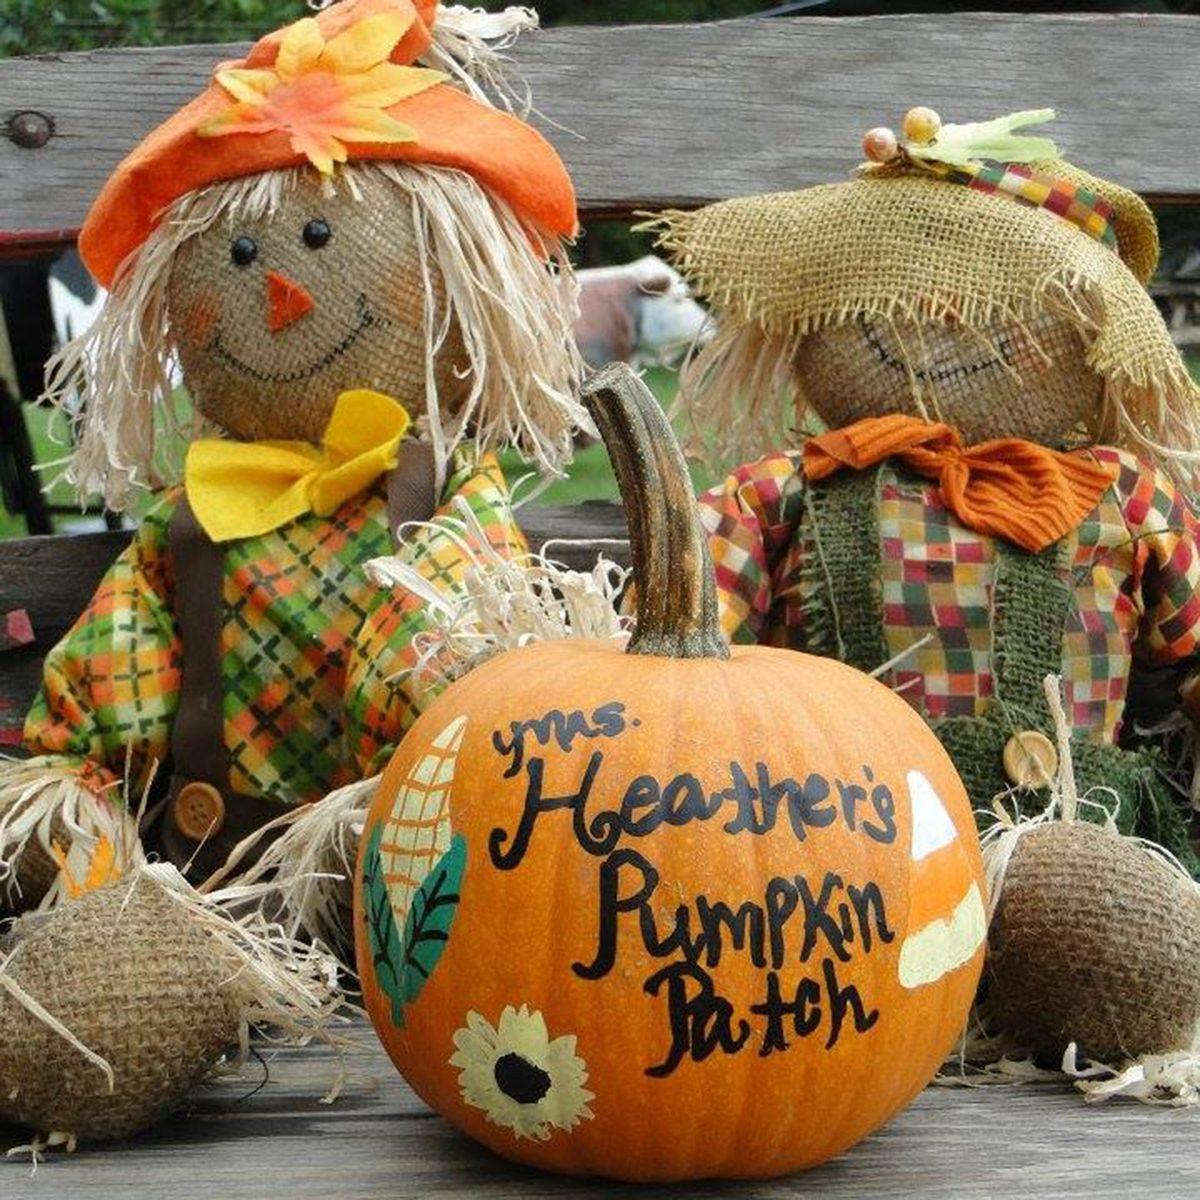 Mrs. Heather's Pumpkin Patch